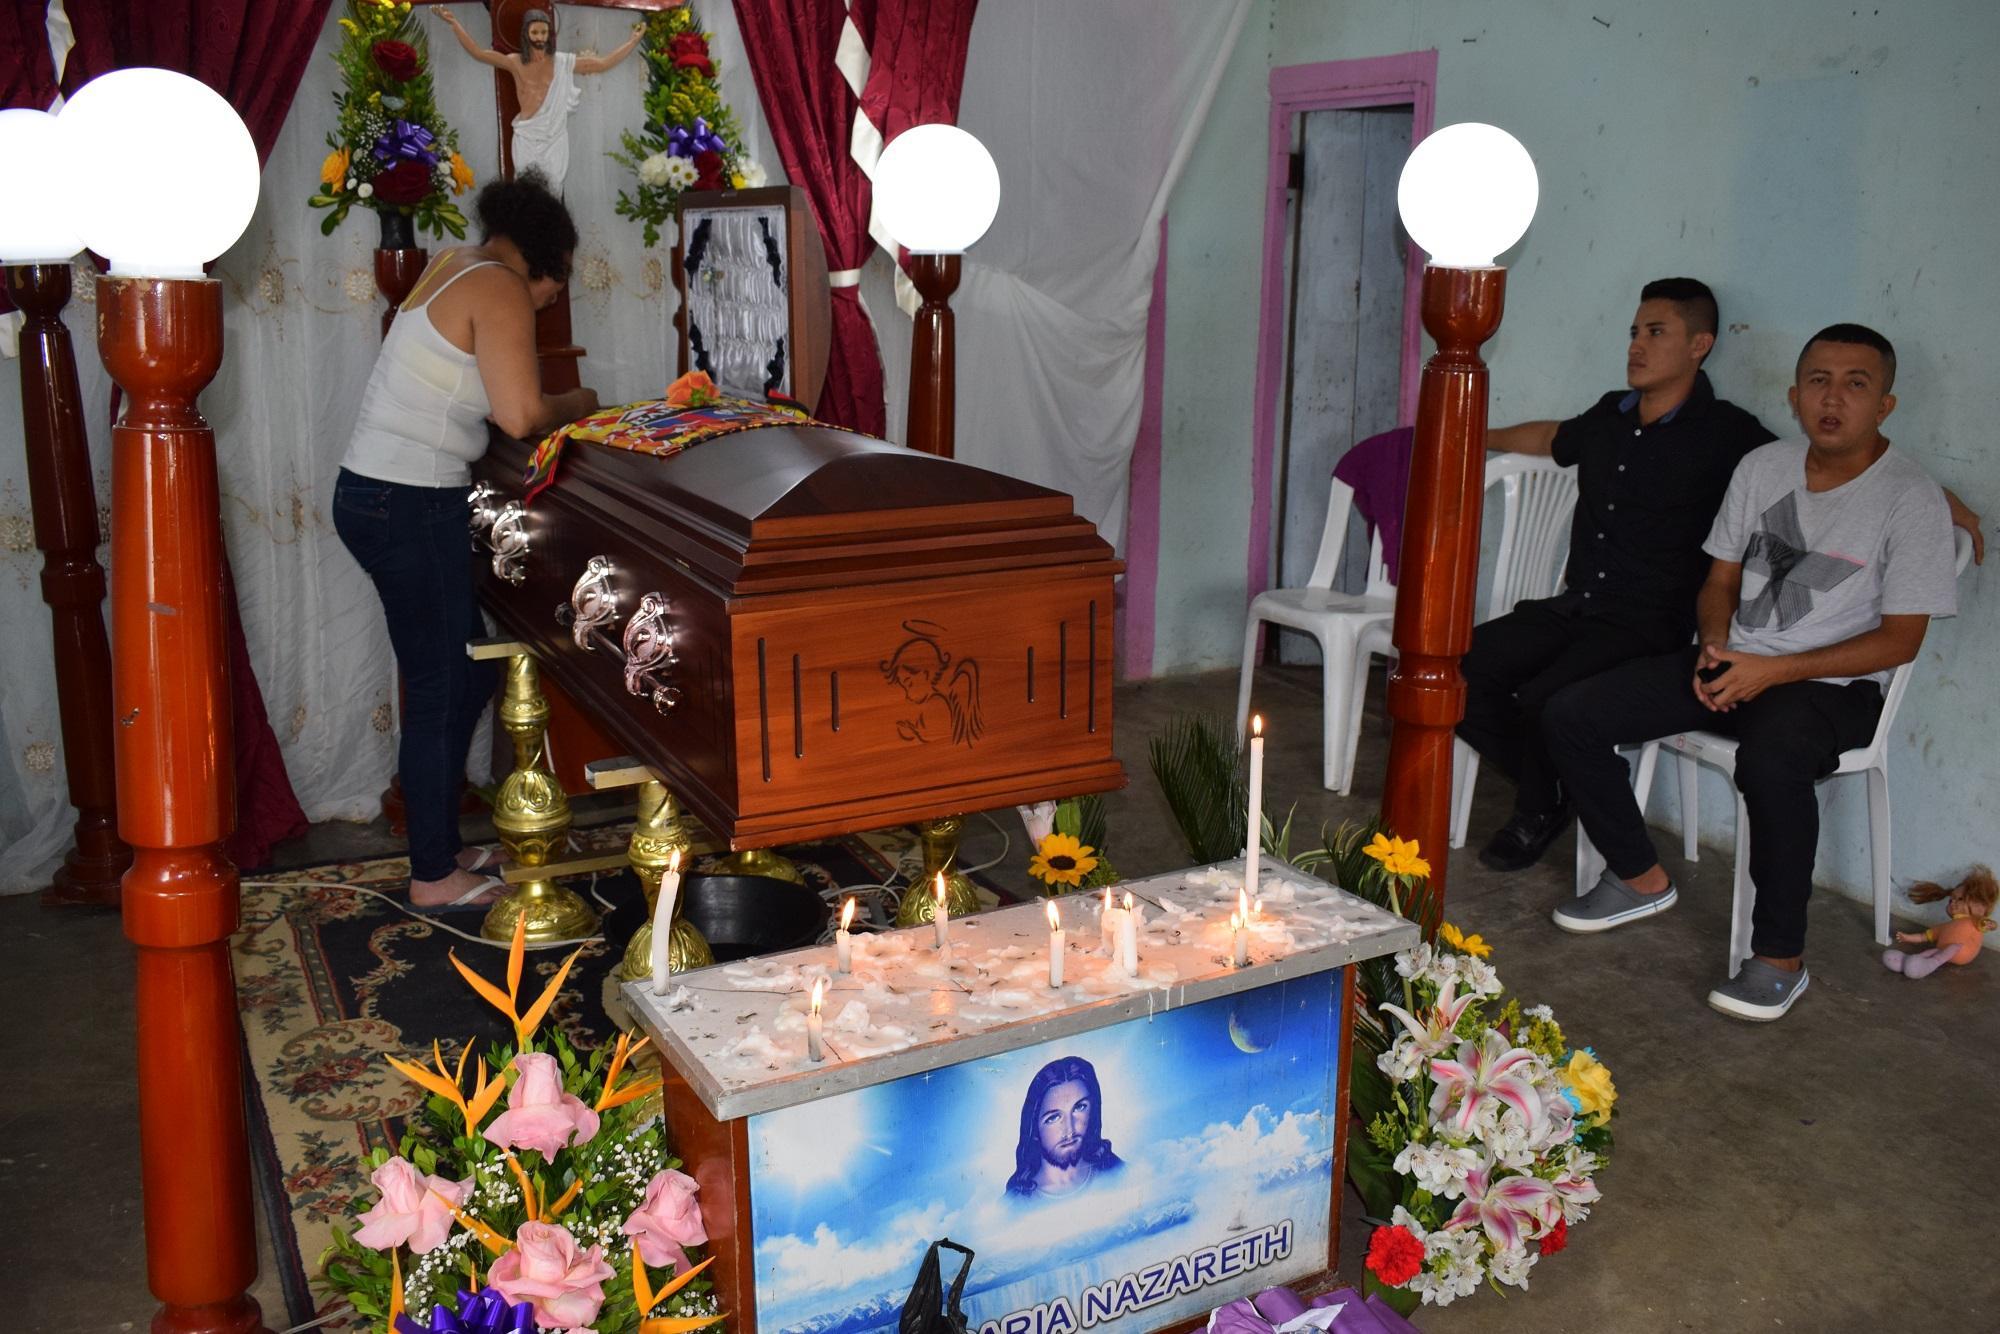 Muere tras sufrir accidente de tránsito